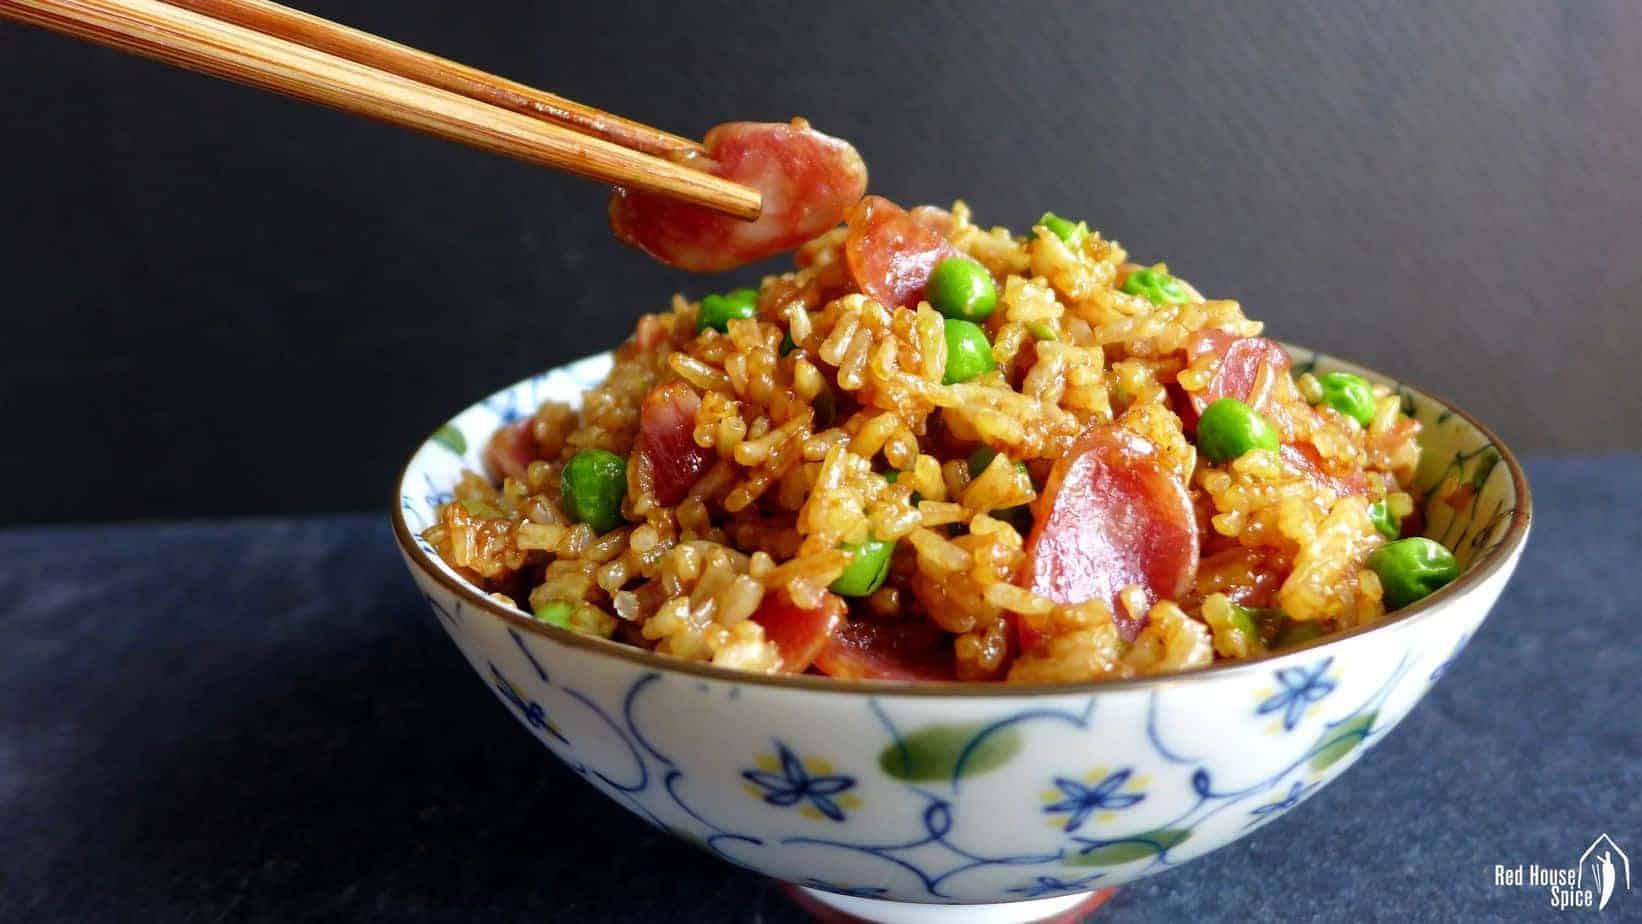 Chinese sausage fried rice (腊肠炒饭)